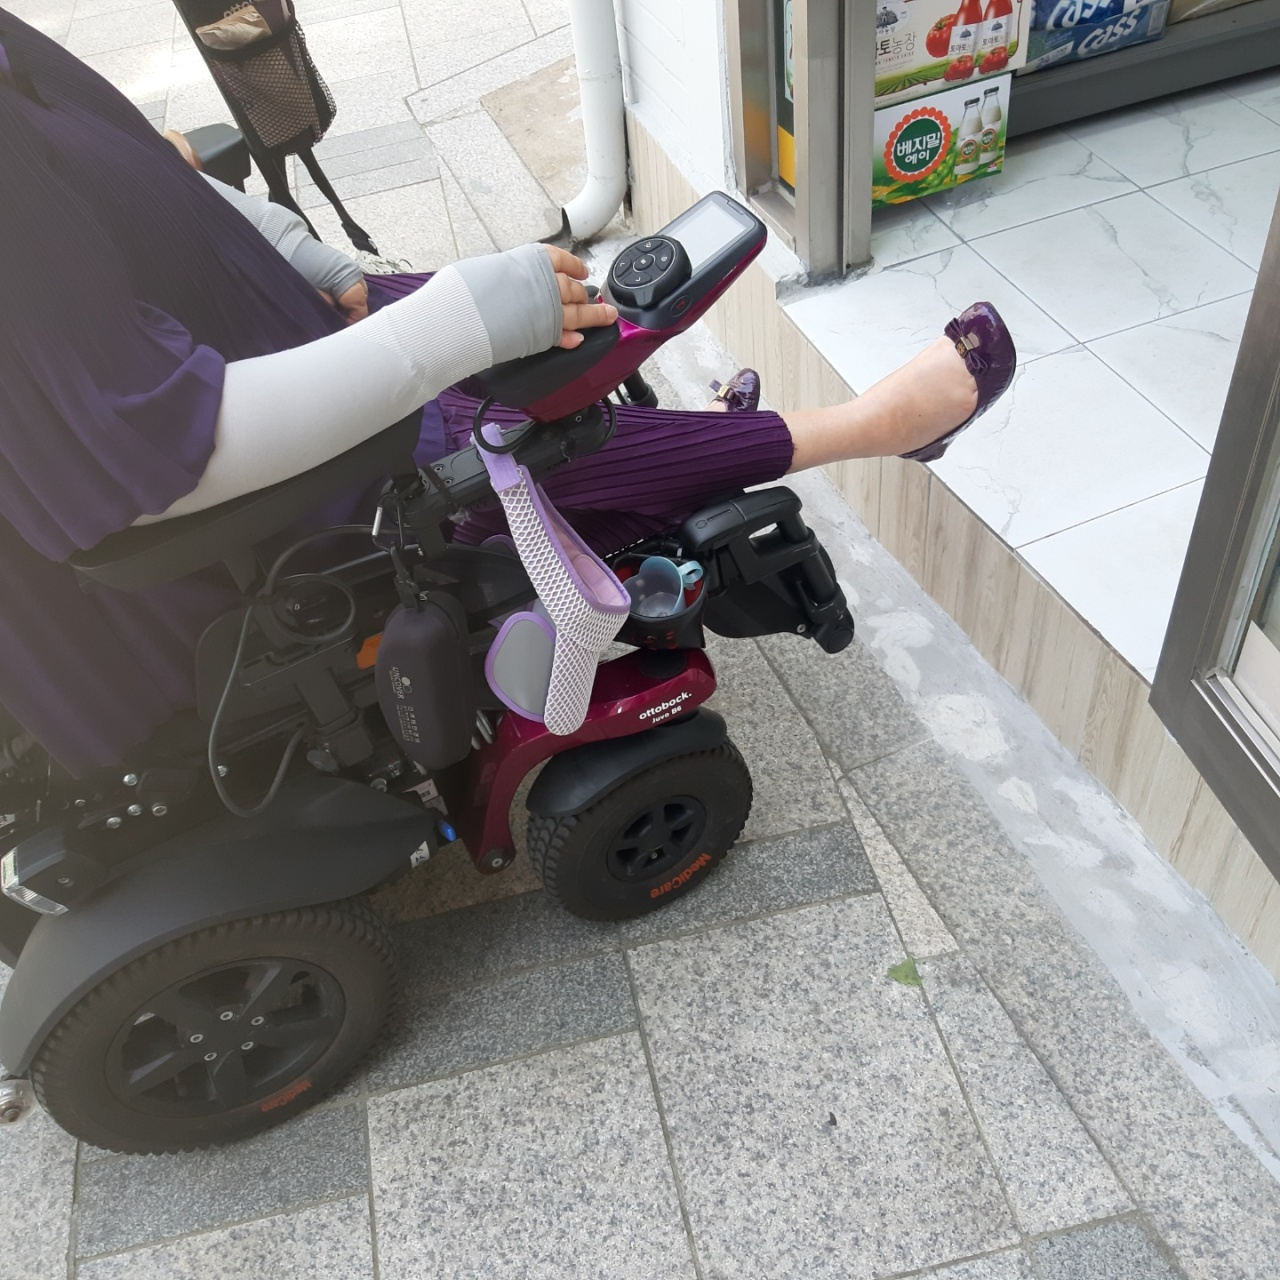 A convenience store in Jung-gu, Seoul, is not wheelchair accessible. (Shin Ji-hye/The Korea Herald)